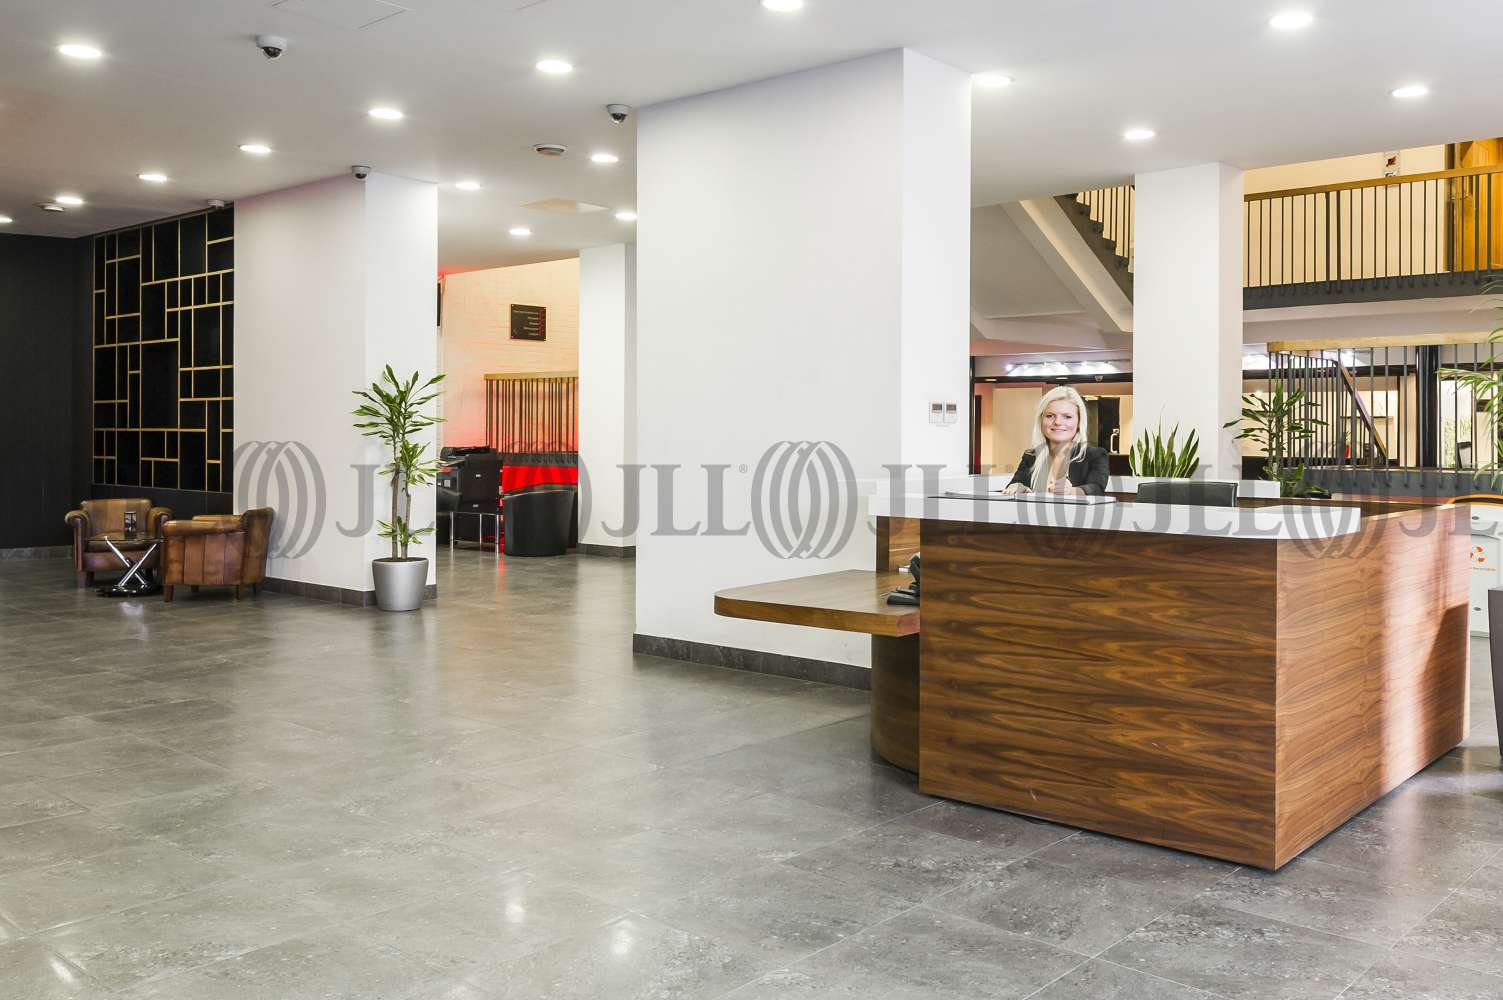 Serviced office London, EC4V 3DB - Mermaid Business Centre